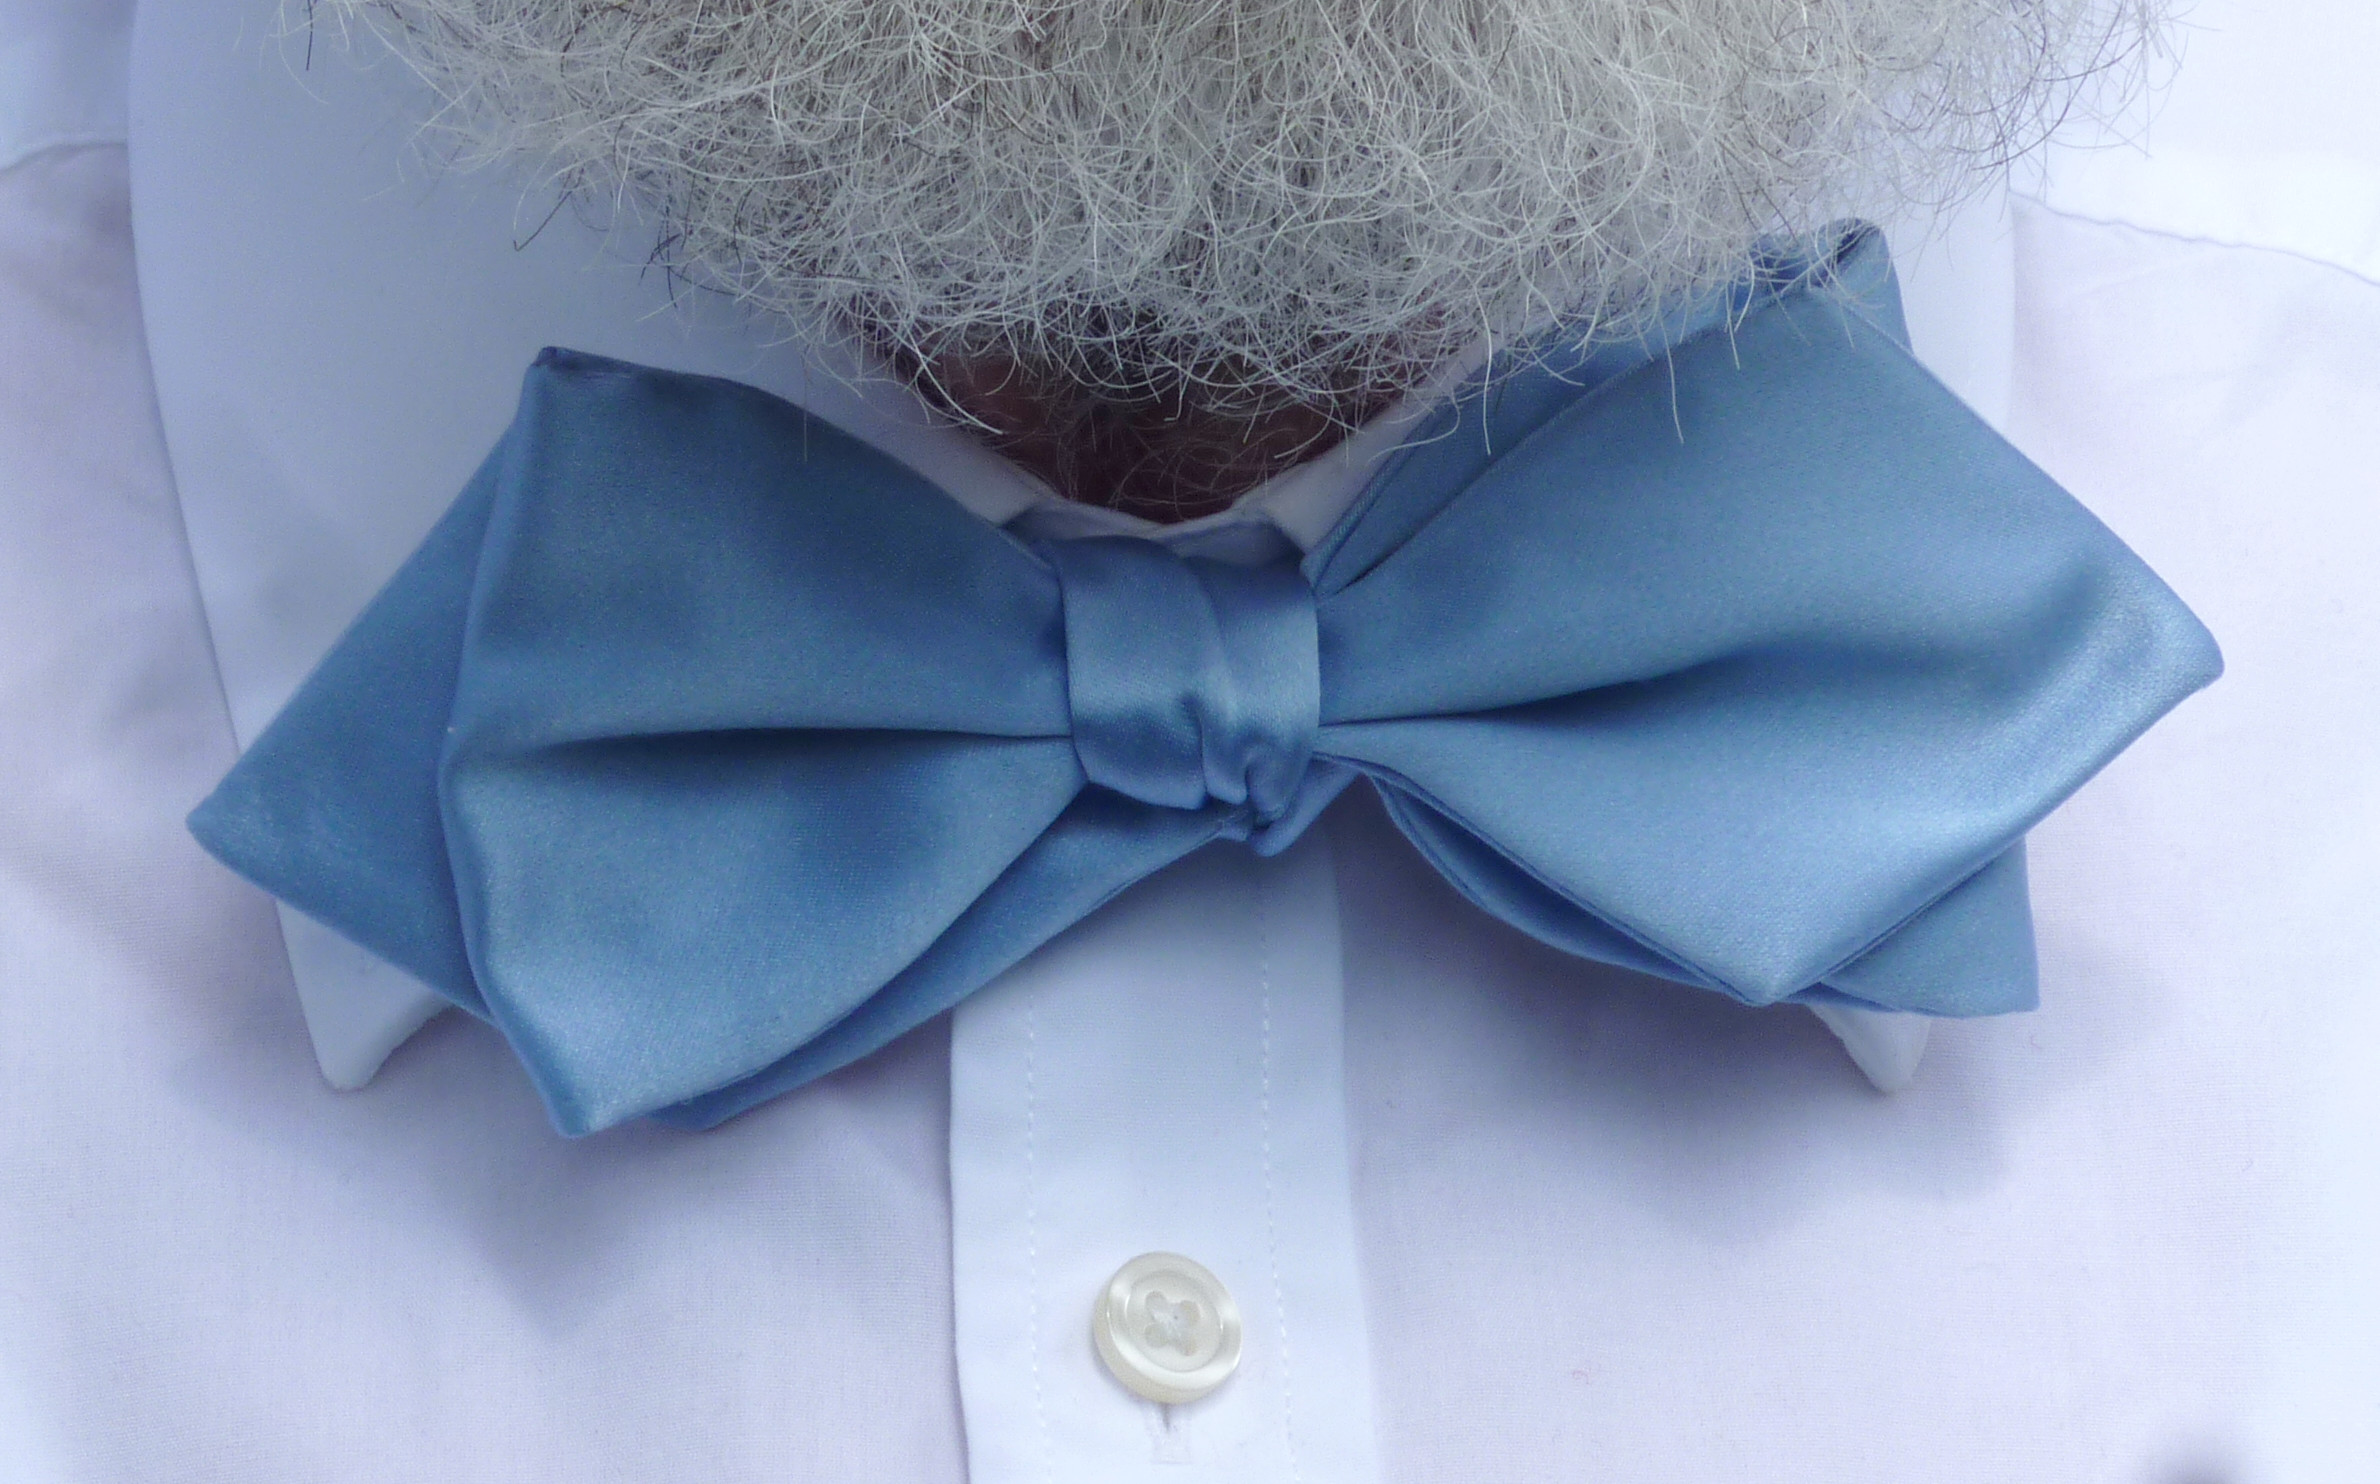 9191527d7390 Bow tie - Wikipedia